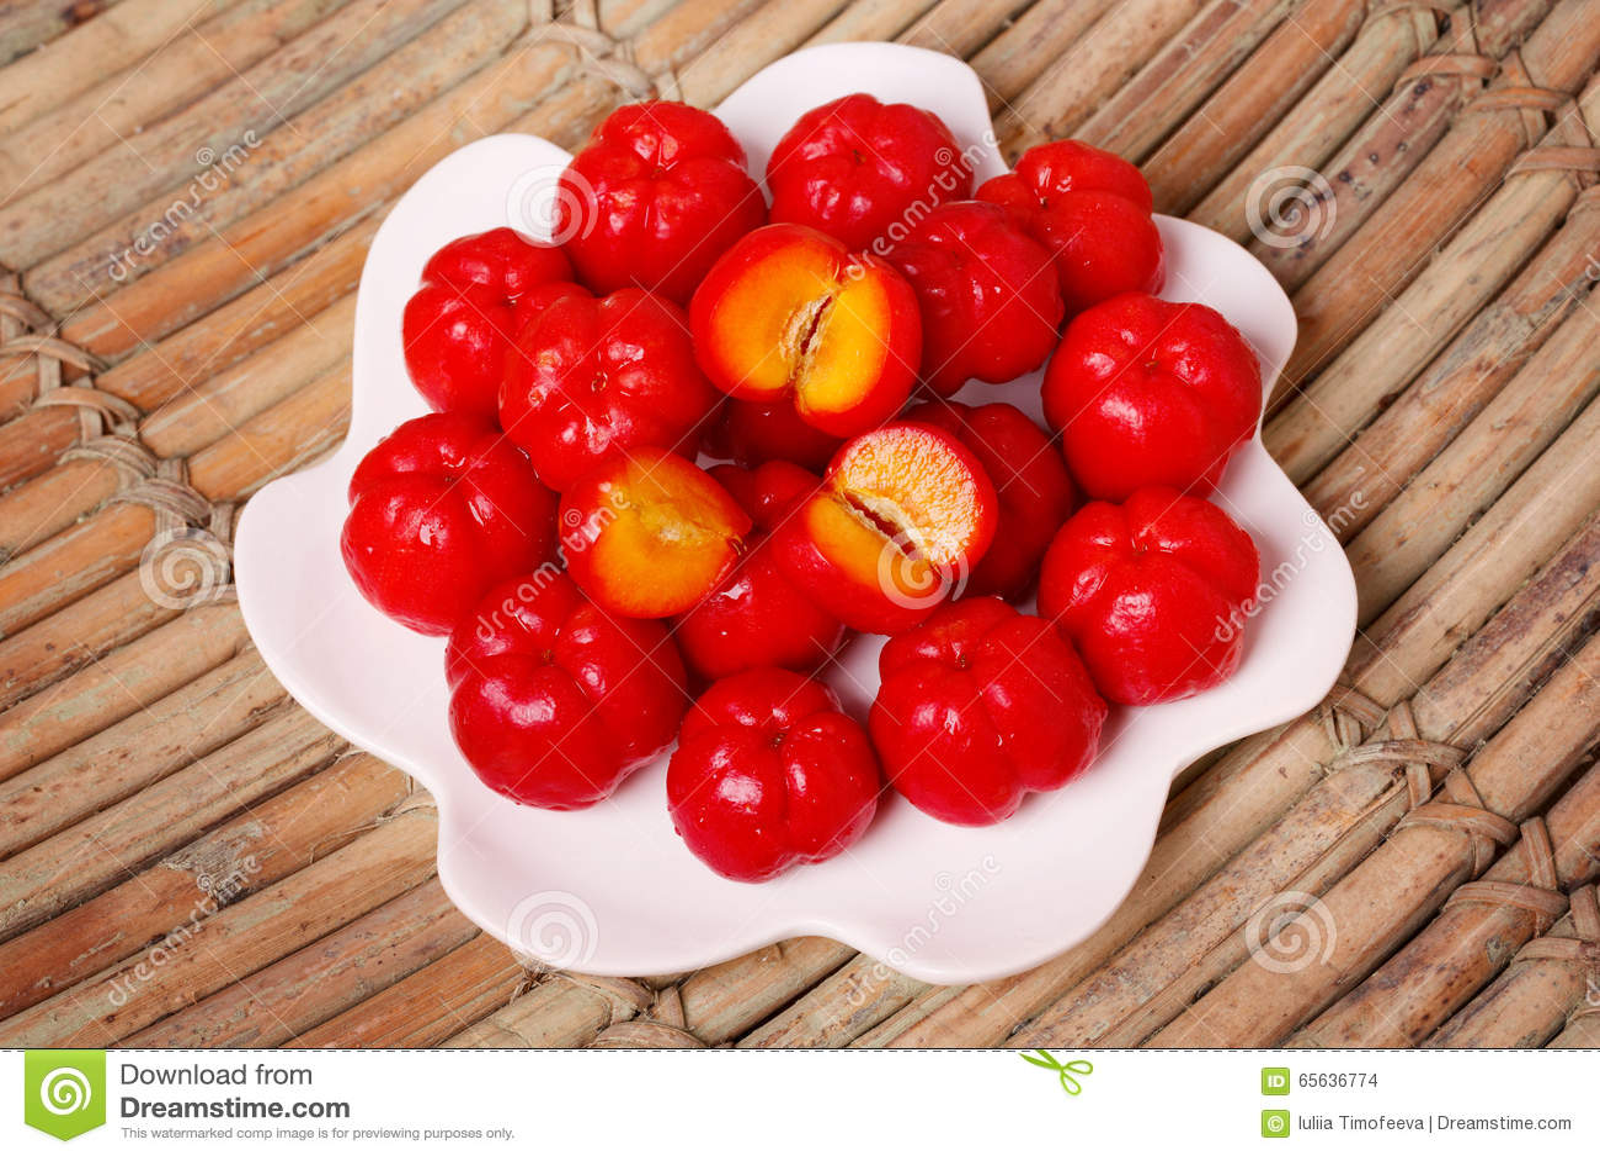 Glabra de malpighie (acerola rouge), fruit tropical